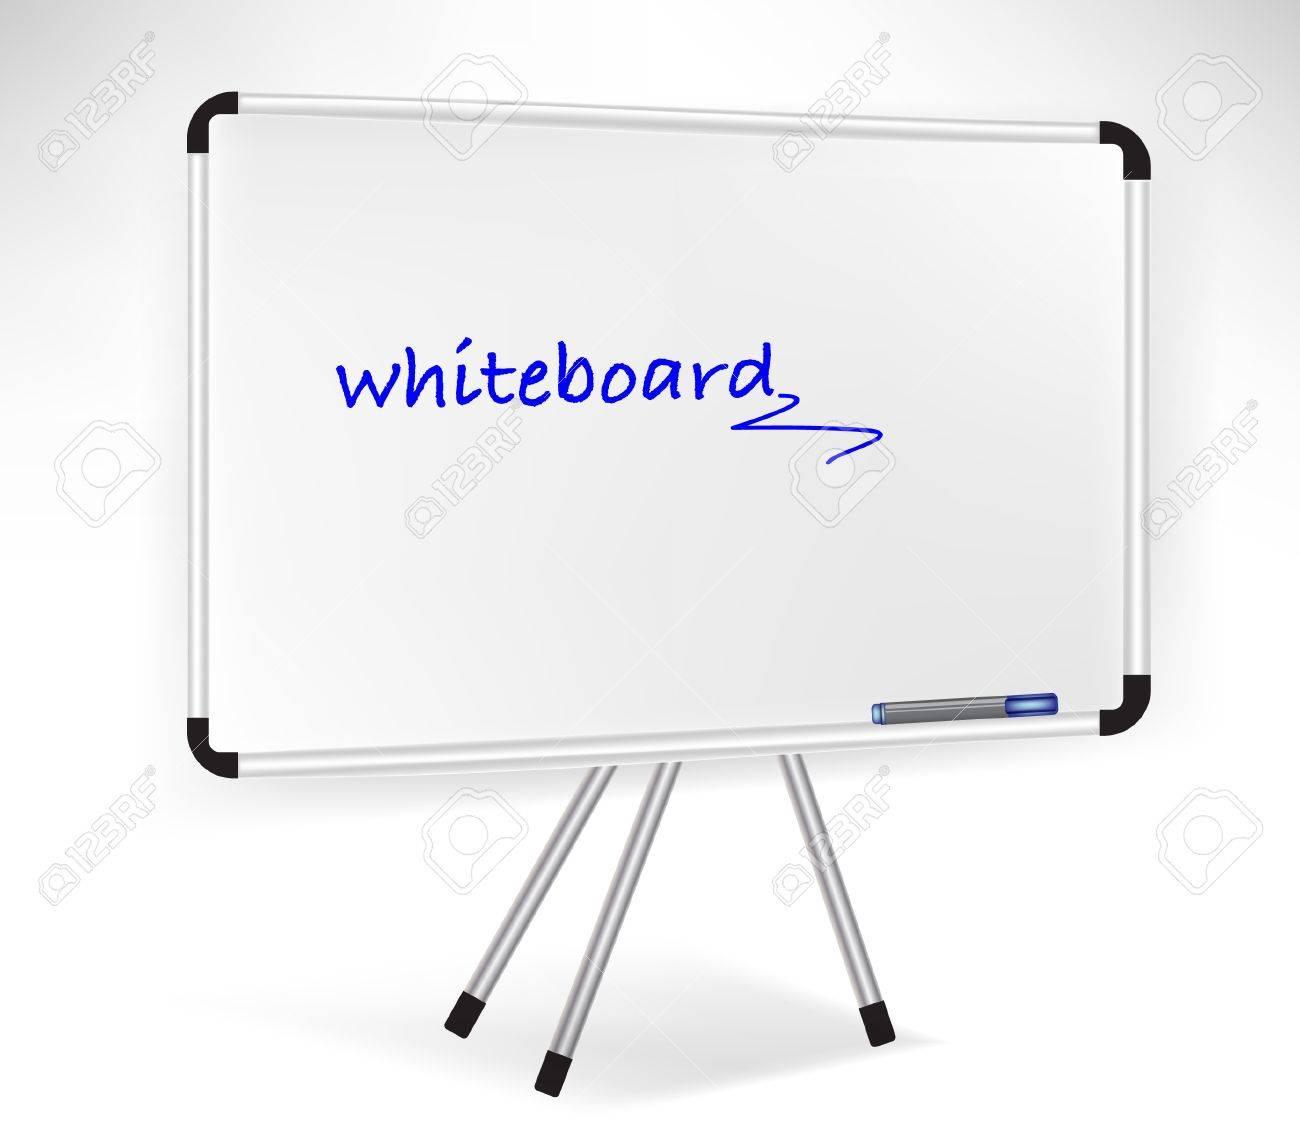 single presentation whiteboard isolated on white royalty free